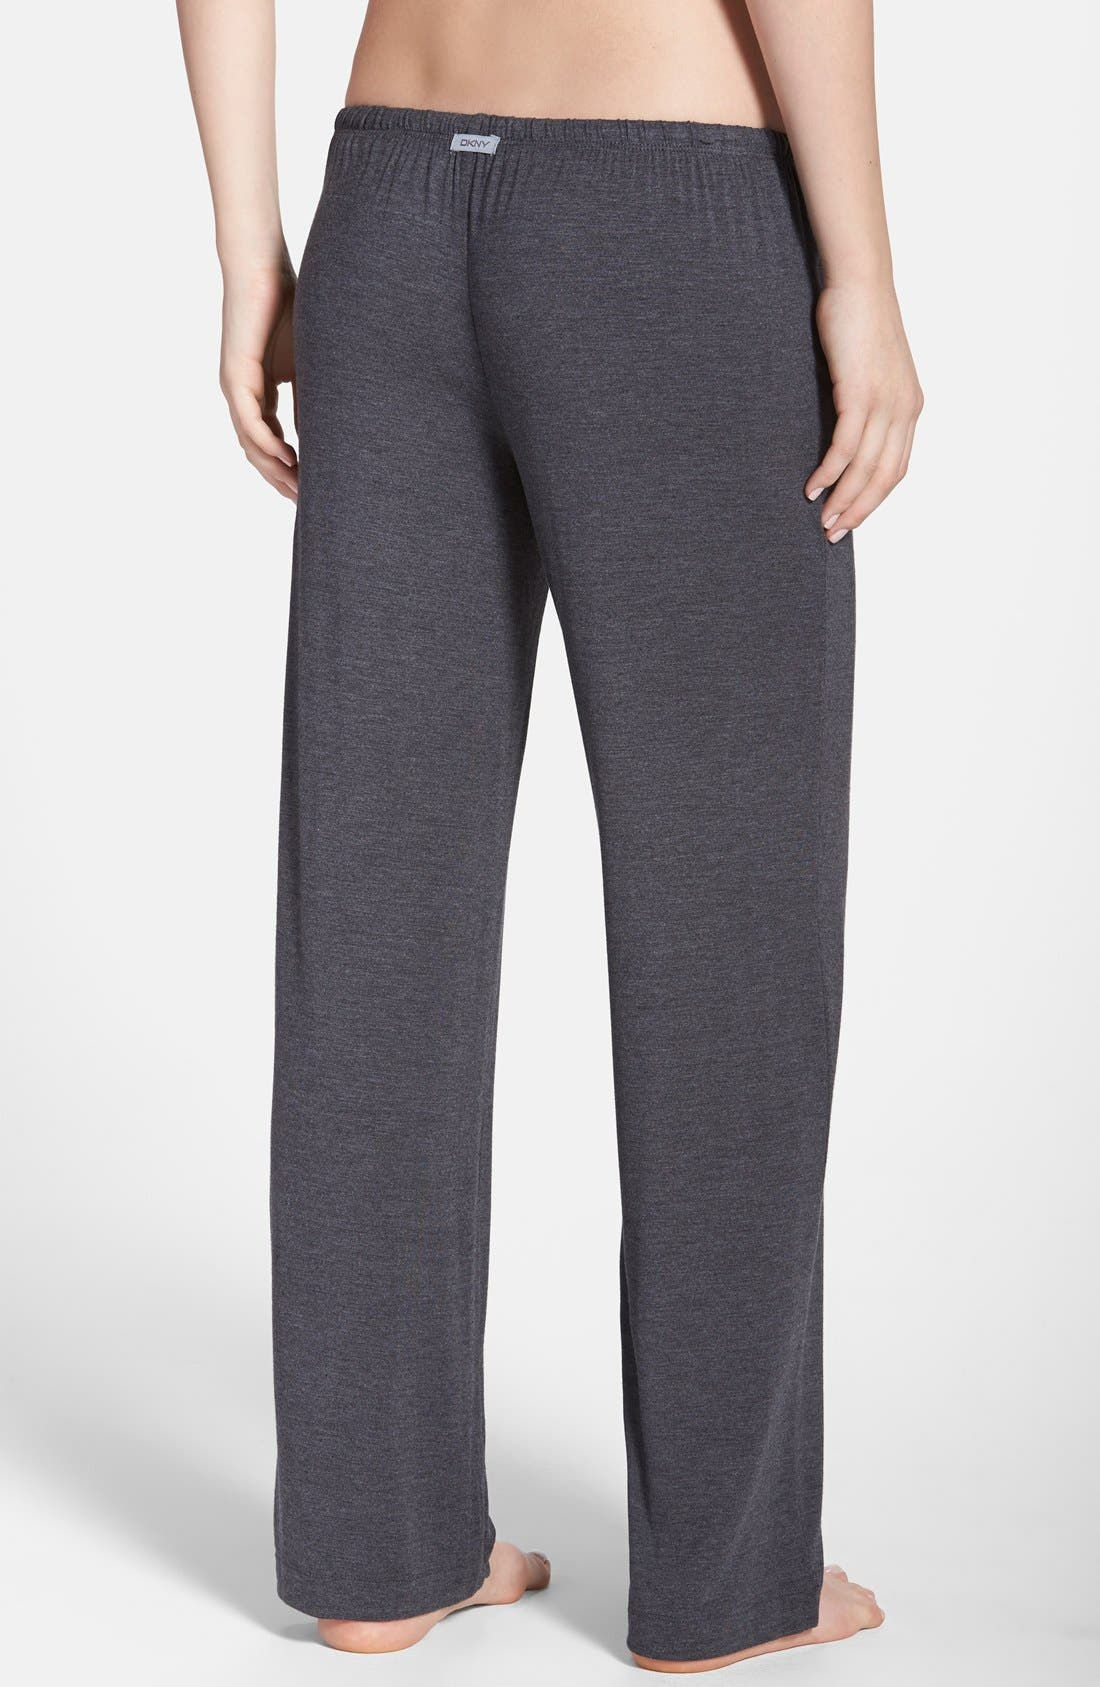 Alternate Image 2  - DKNY 'Urban Essentials' Lounge Pants